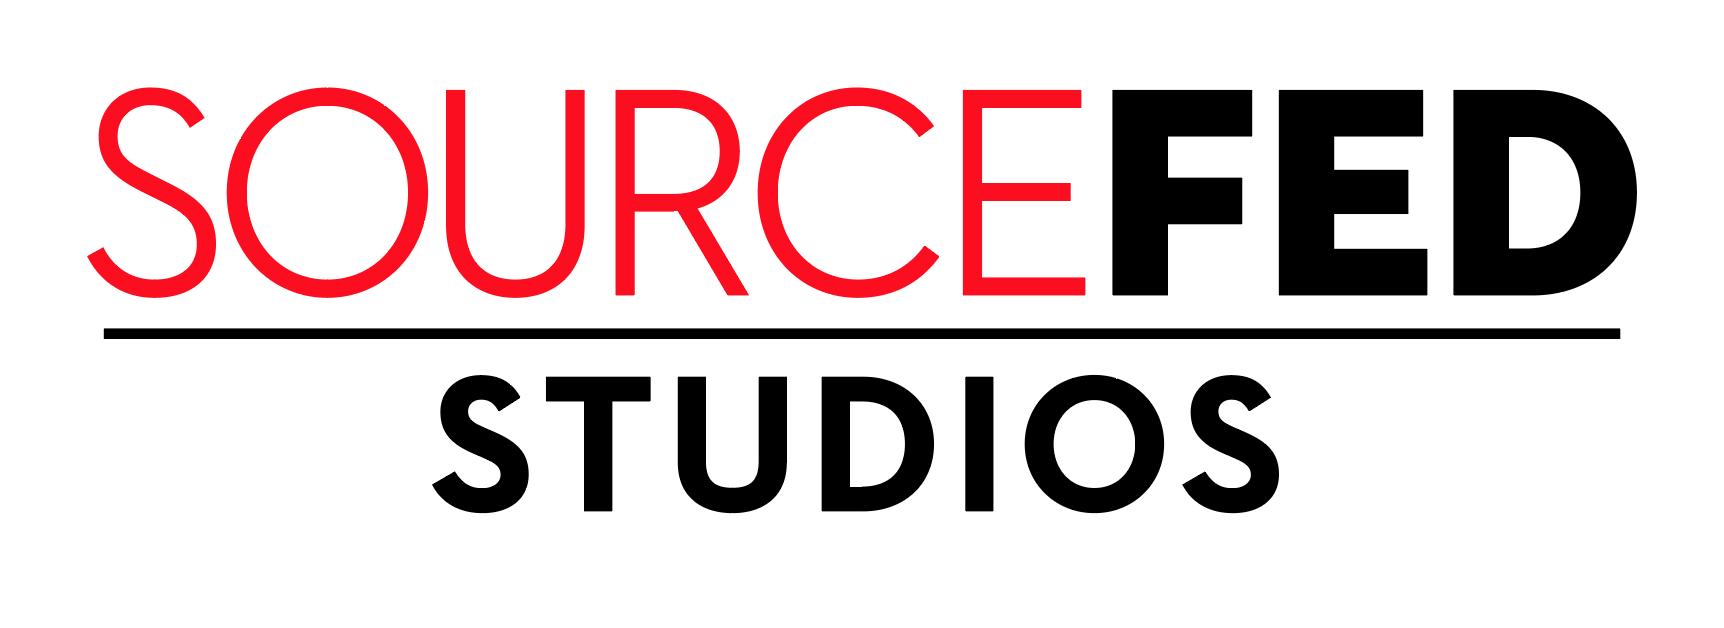 SourceFed-Studios-Logo.png